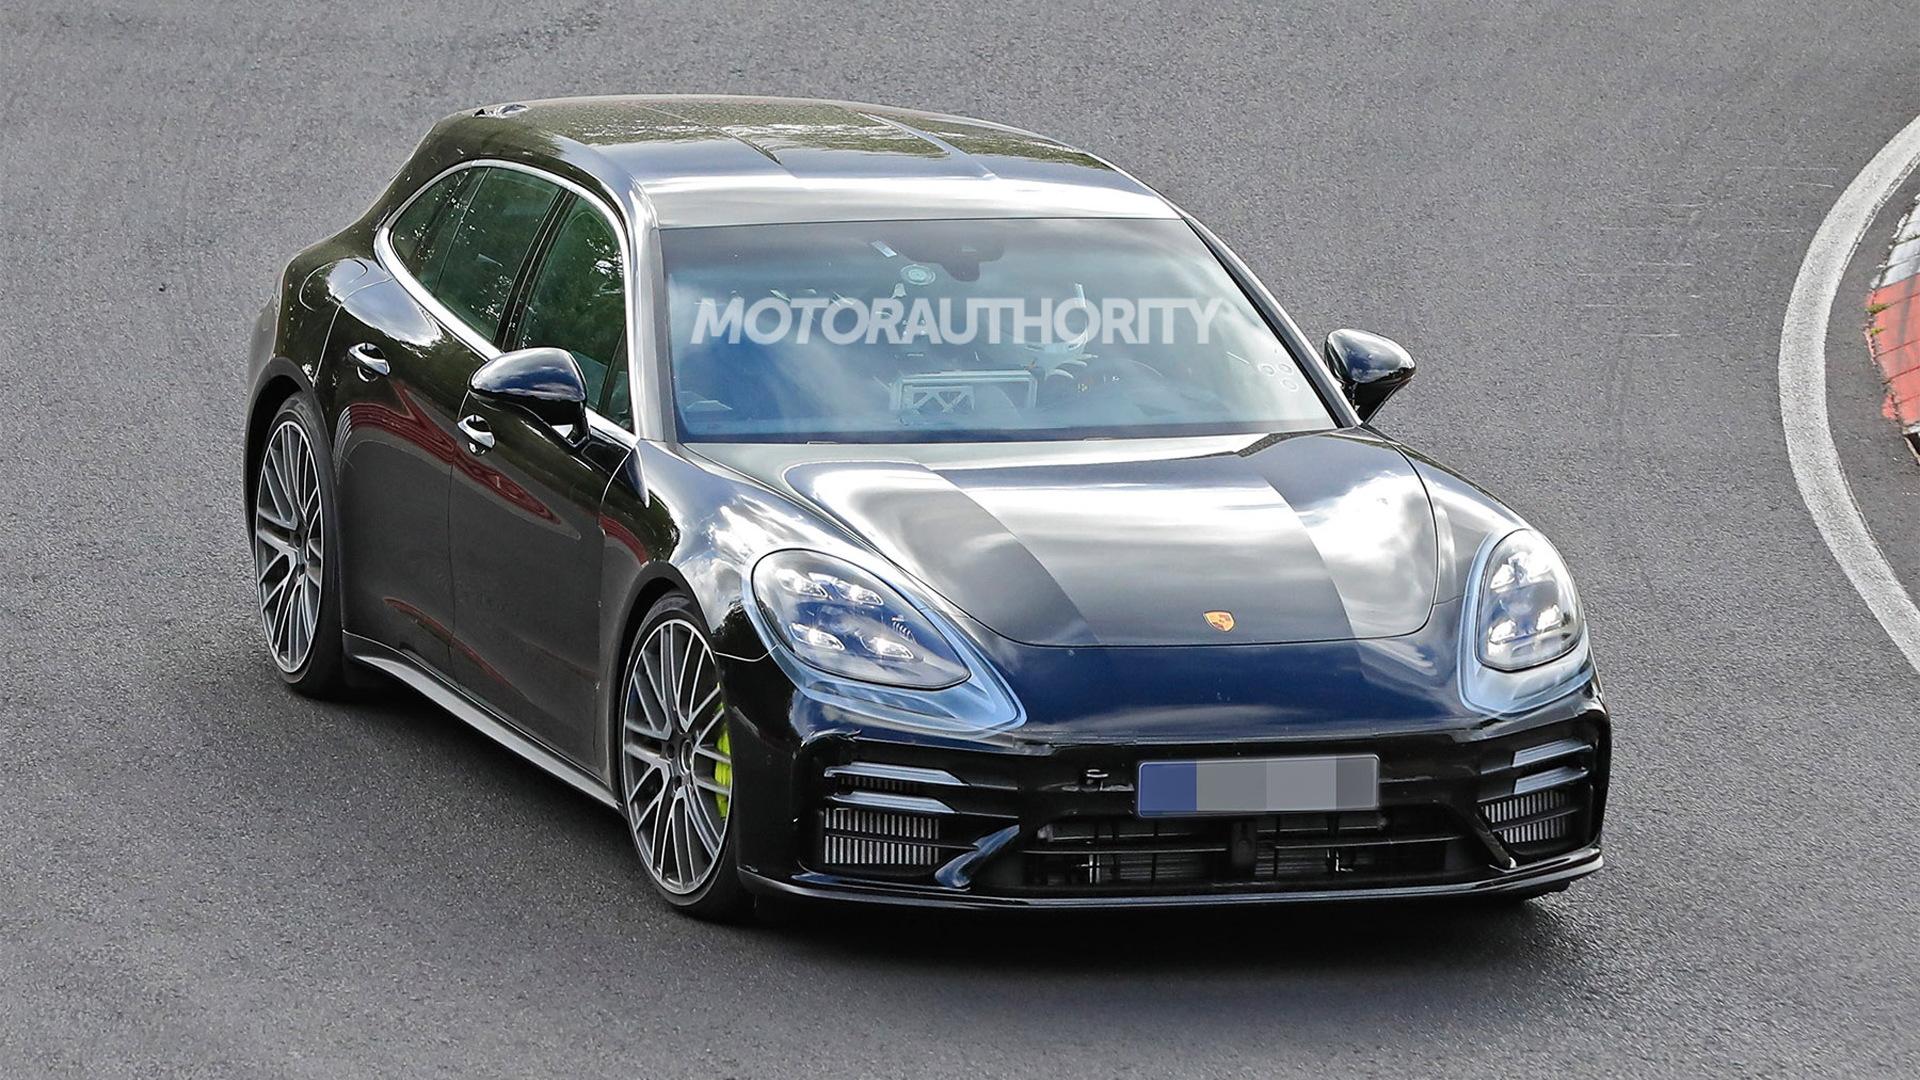 2021 Porsche Panamera Sport Turismo facelift spy shots - Photo credit: S. Baldauf/SB-Medien